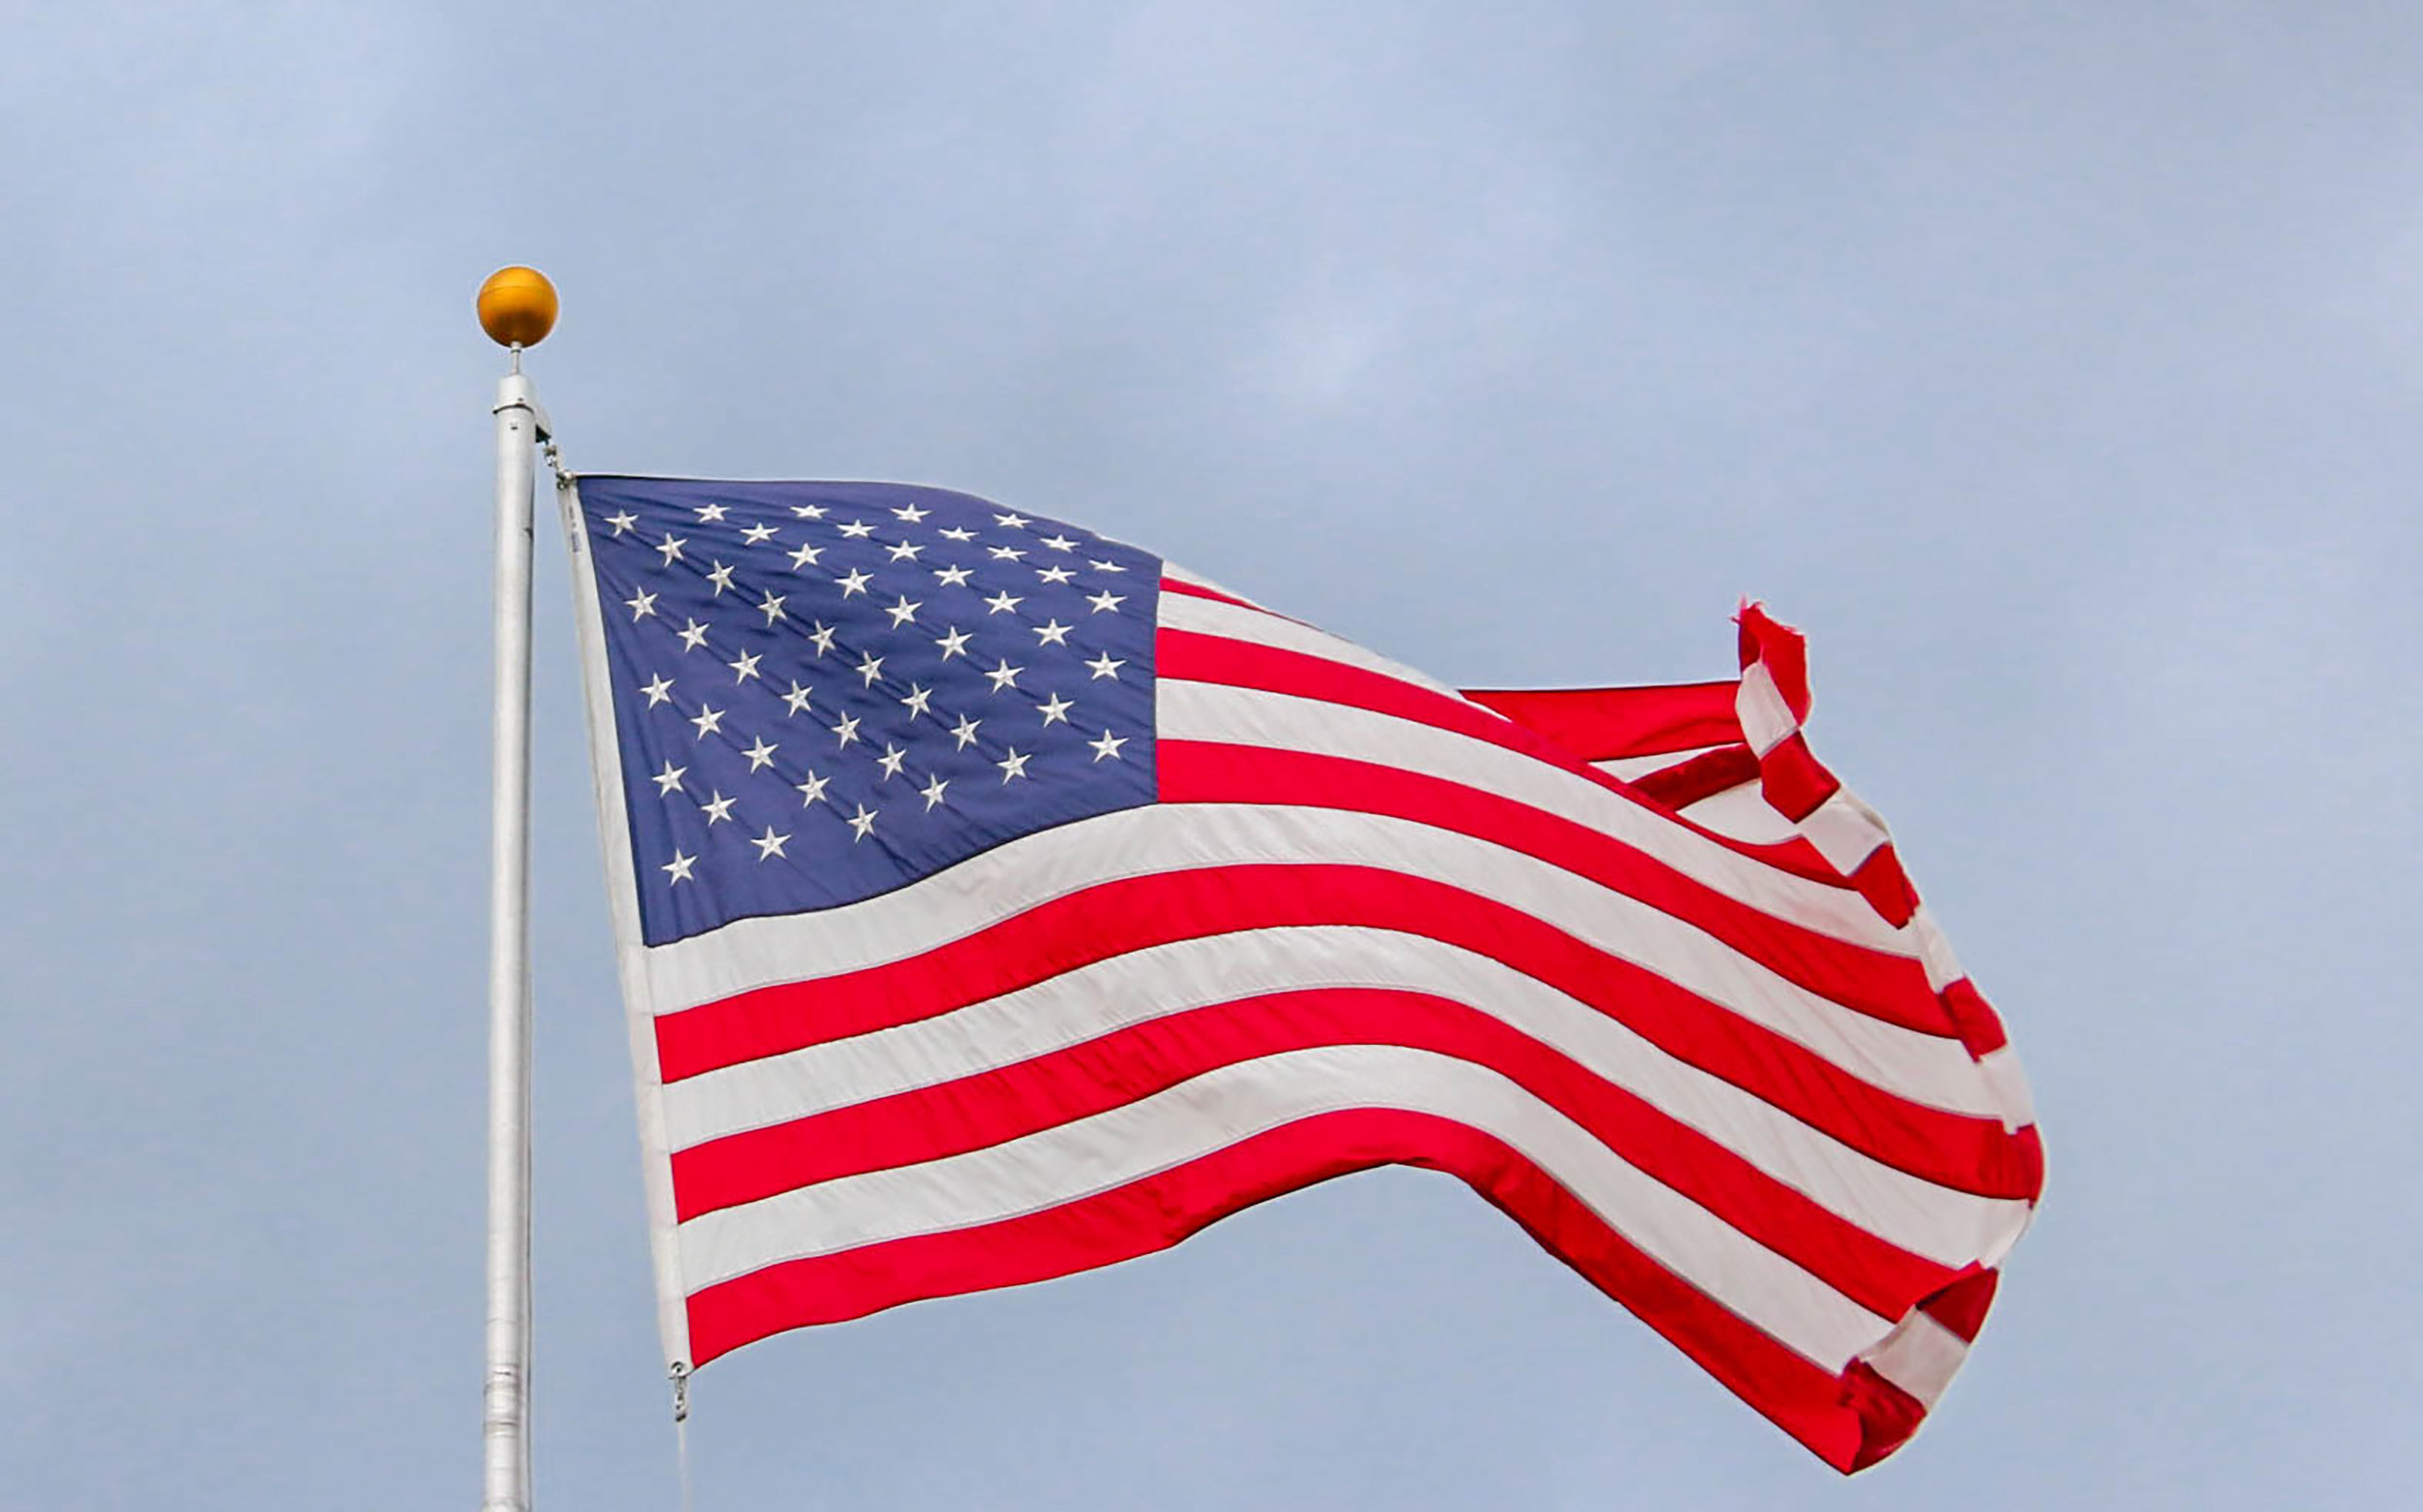 Flag and Flagpole - $10,000